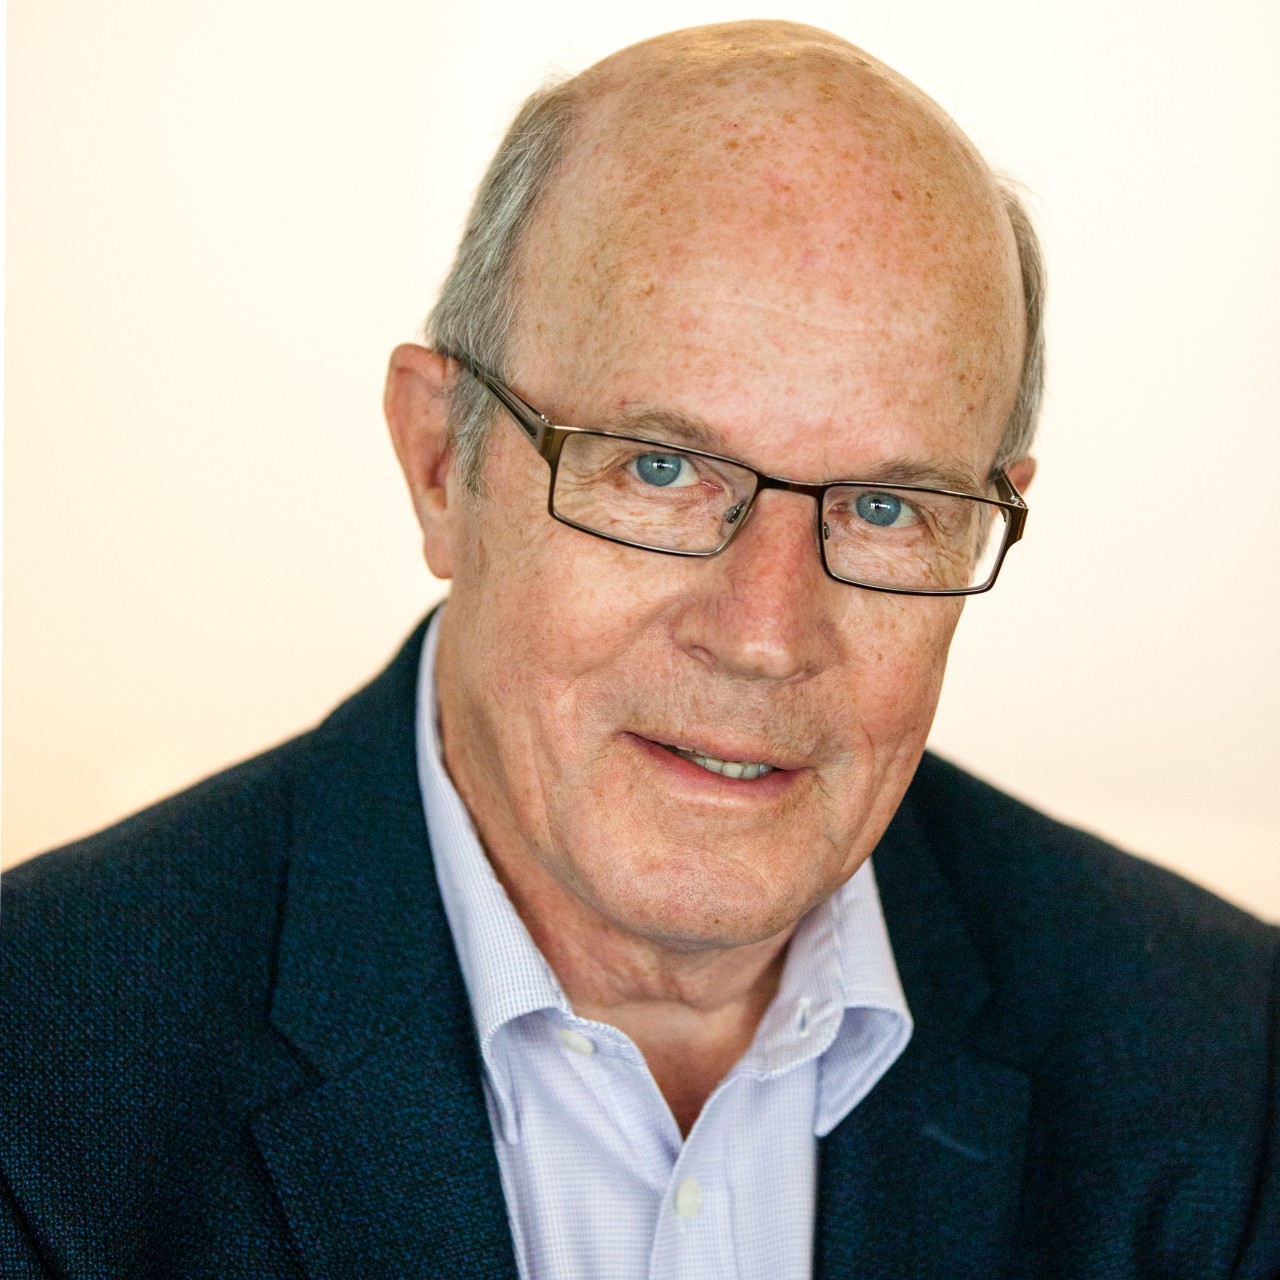 Drs W. (Wim) de Nobel